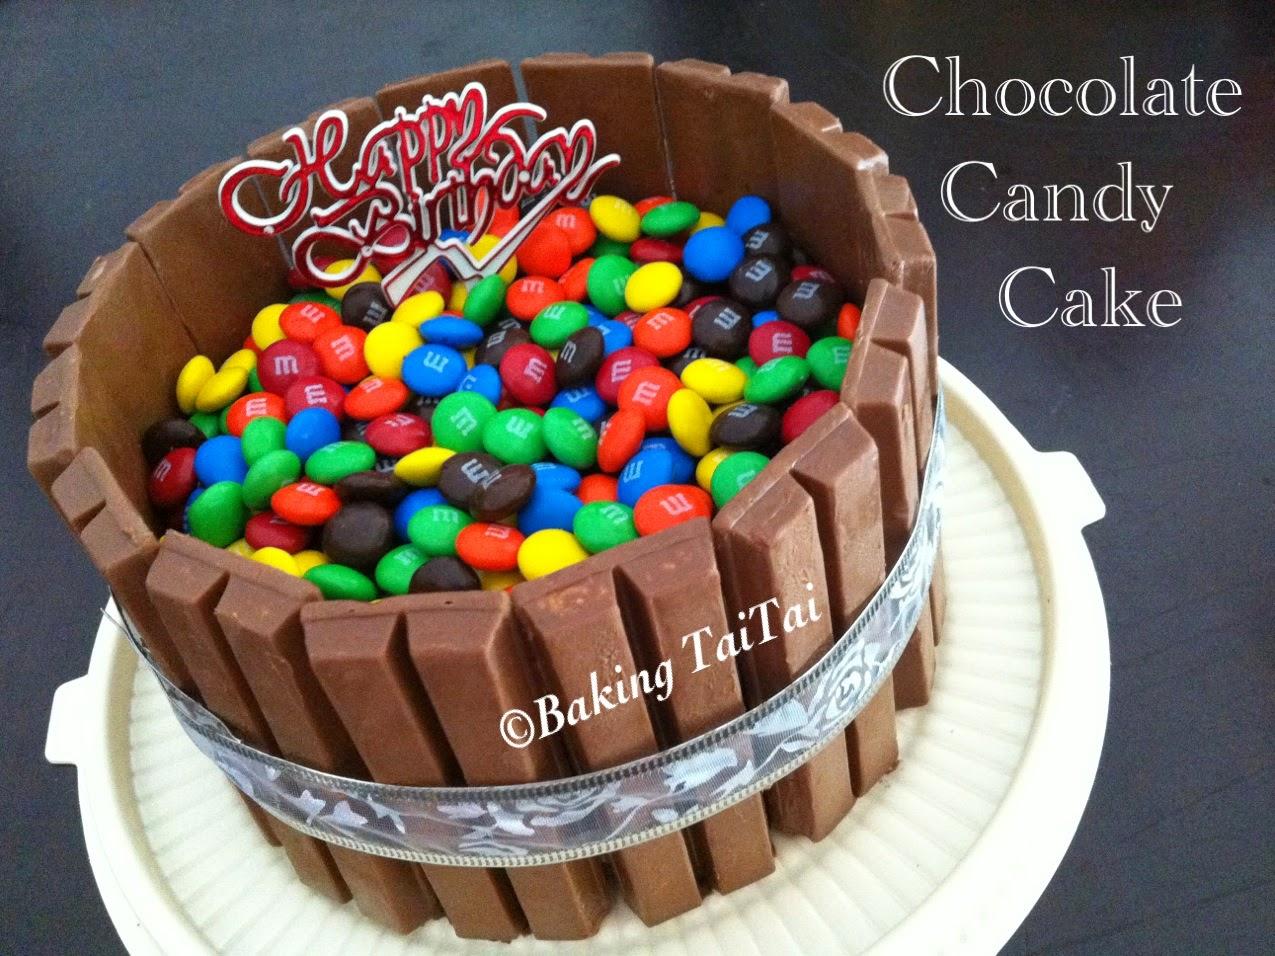 Baking taitai chocolate candy theme cake 1